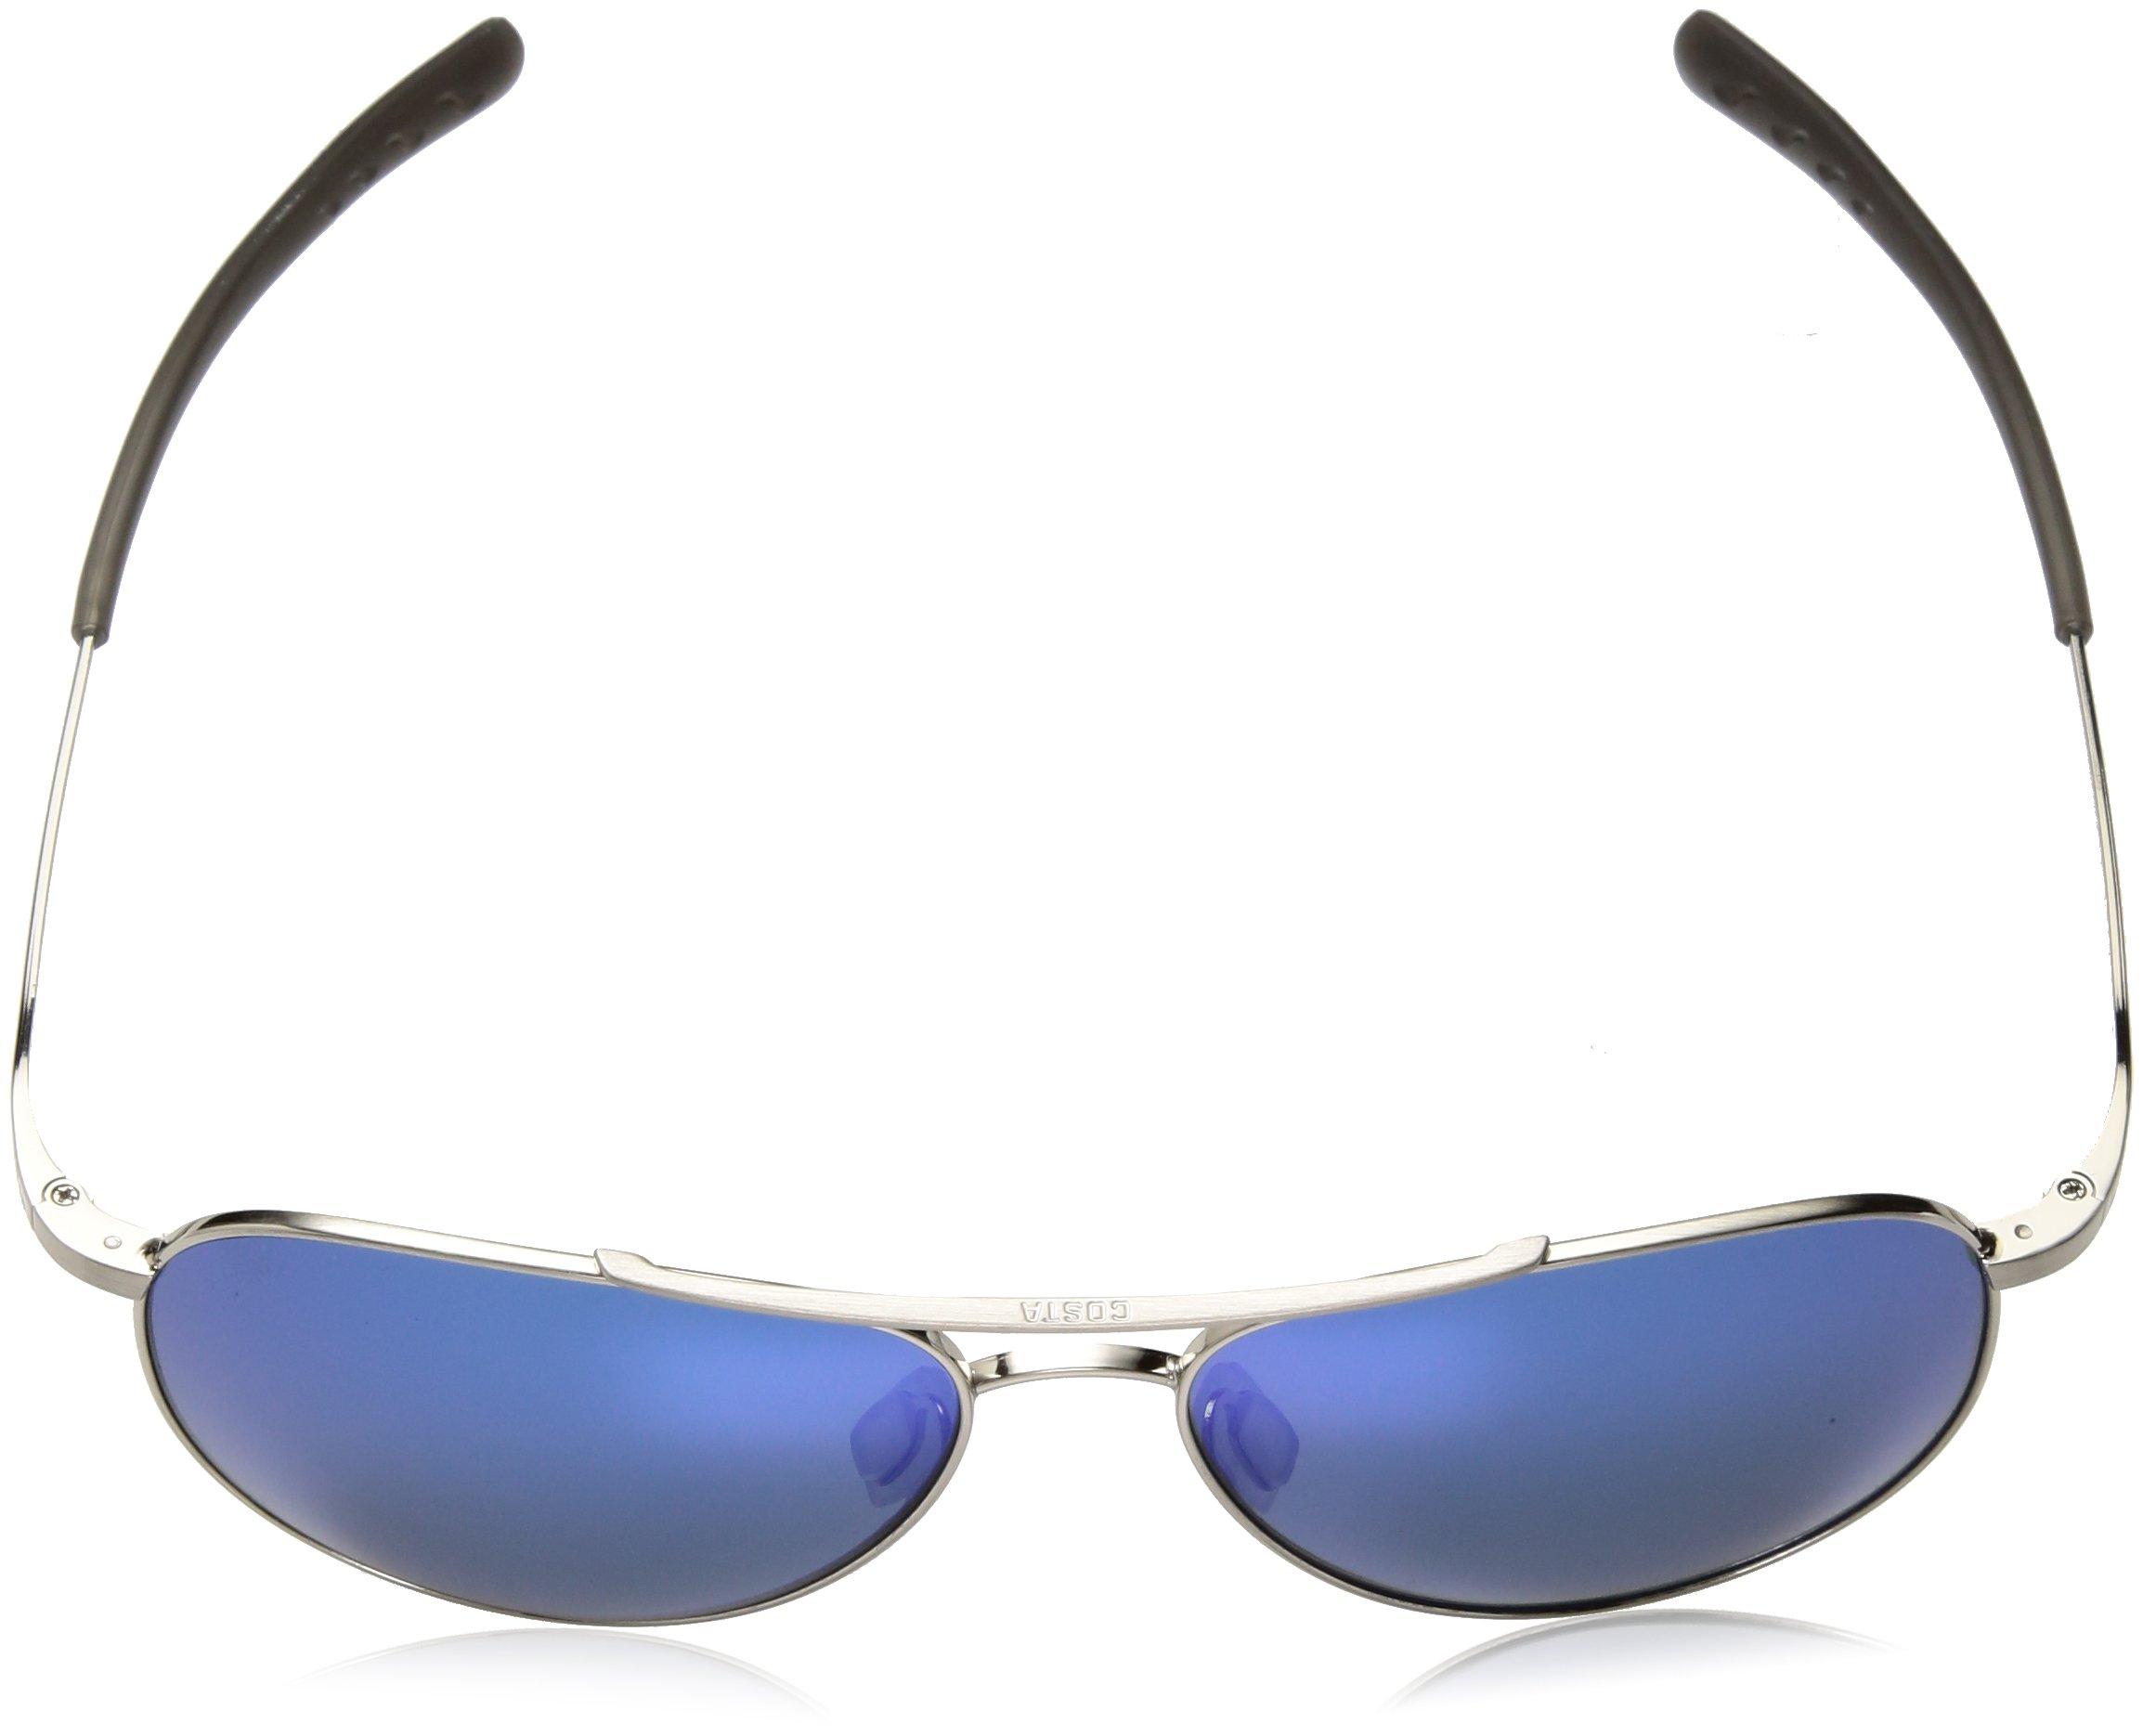 Costa del Mar Cook Polarized Iridium Aviator Sunglasses, Brushed Palladium, 59.7 mm by Costa Del Mar (Image #4)